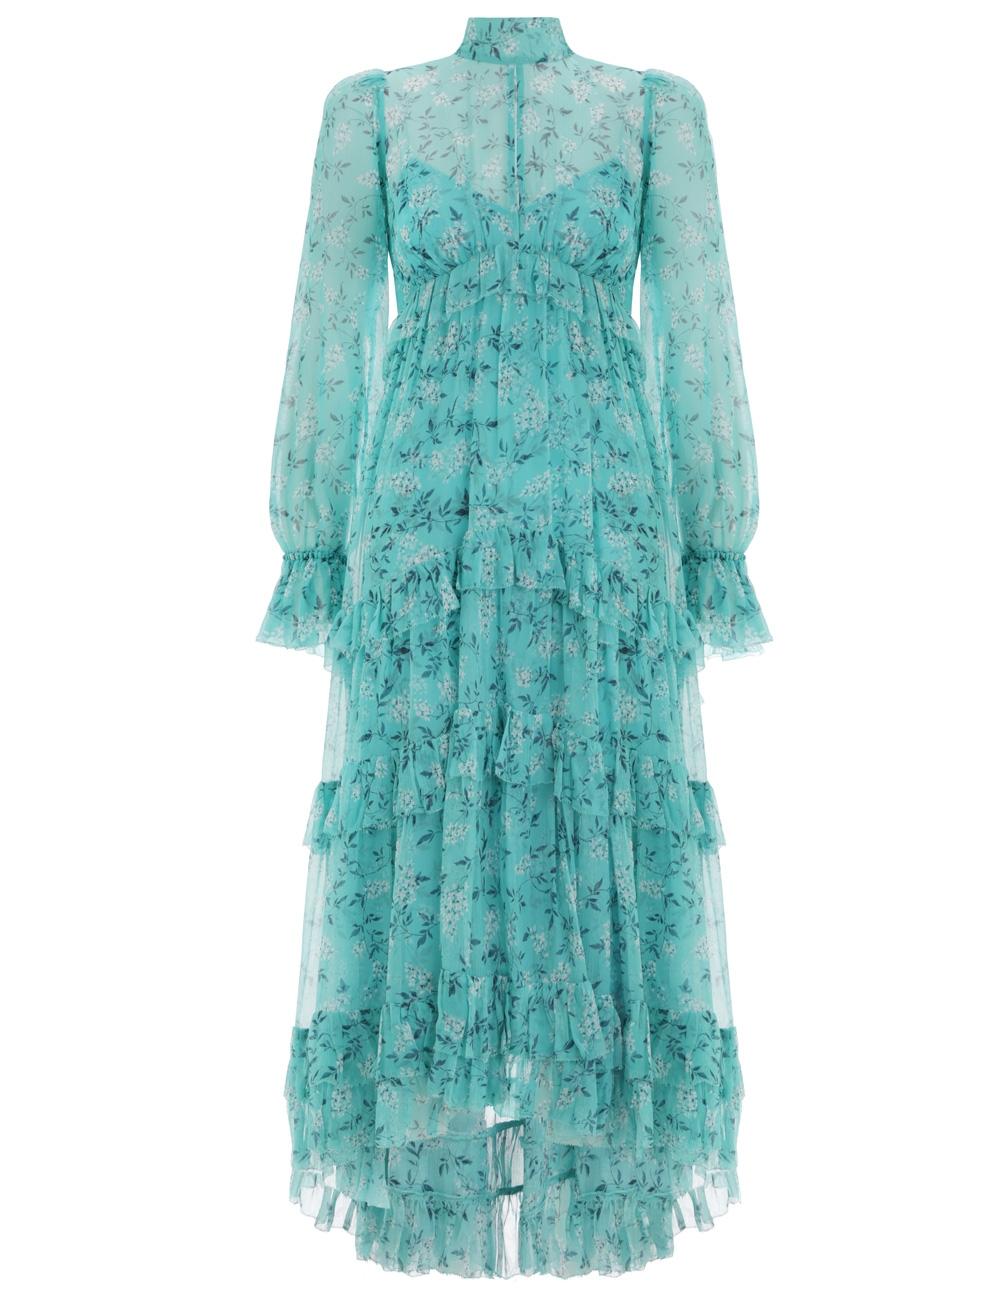 0310f2282128a Moncur Gathered Frill Dress